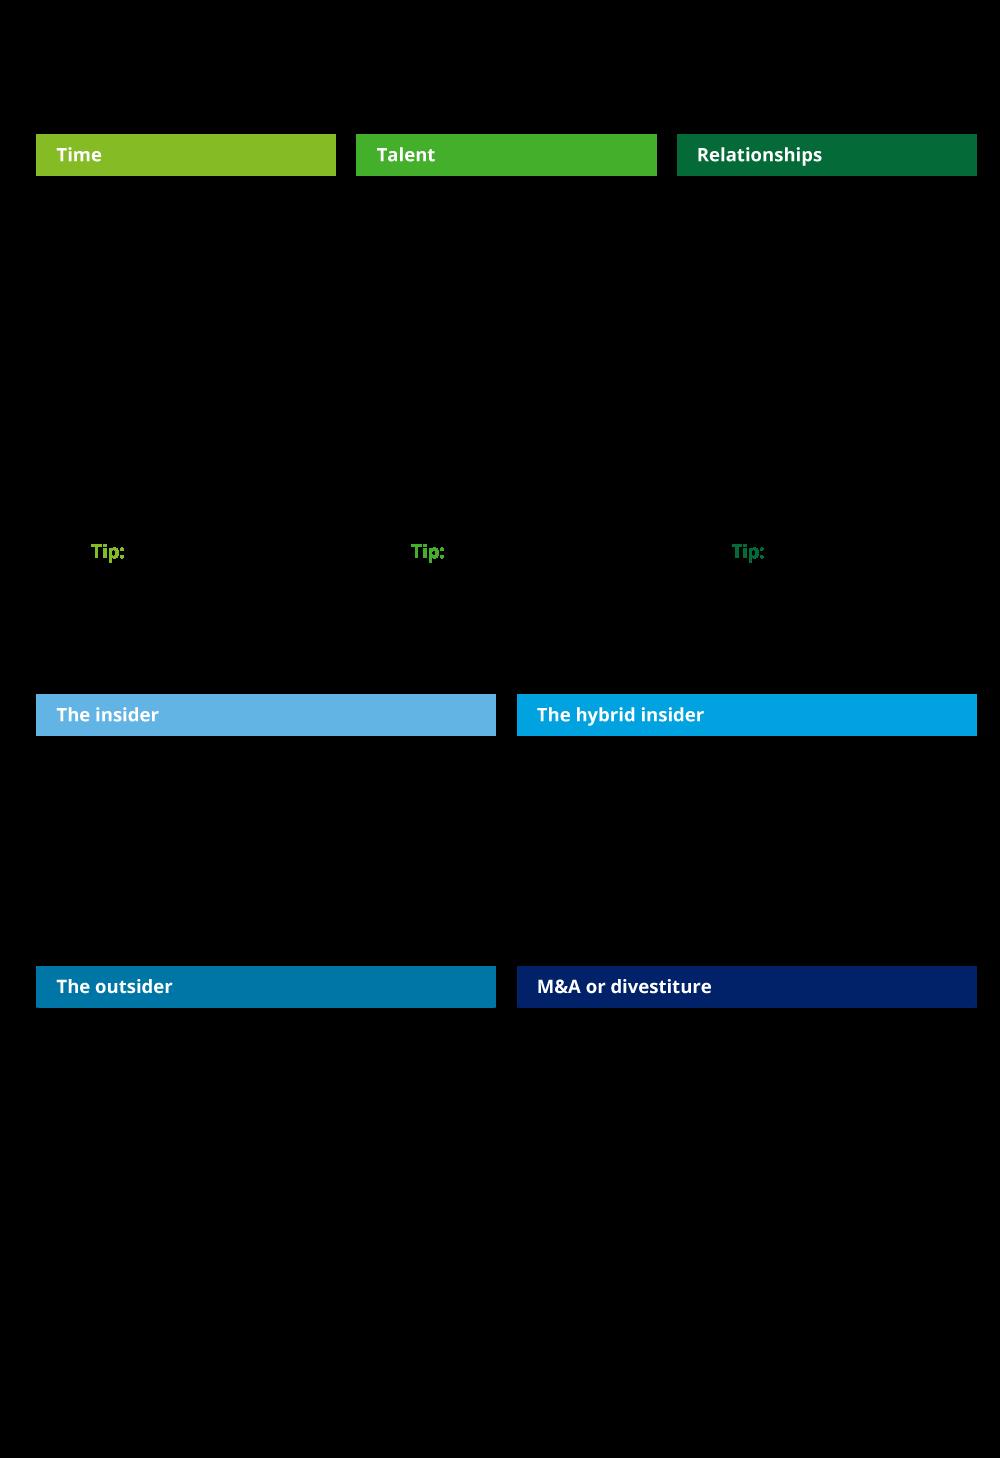 Transition strategies for CIOs | Deloitte Insights